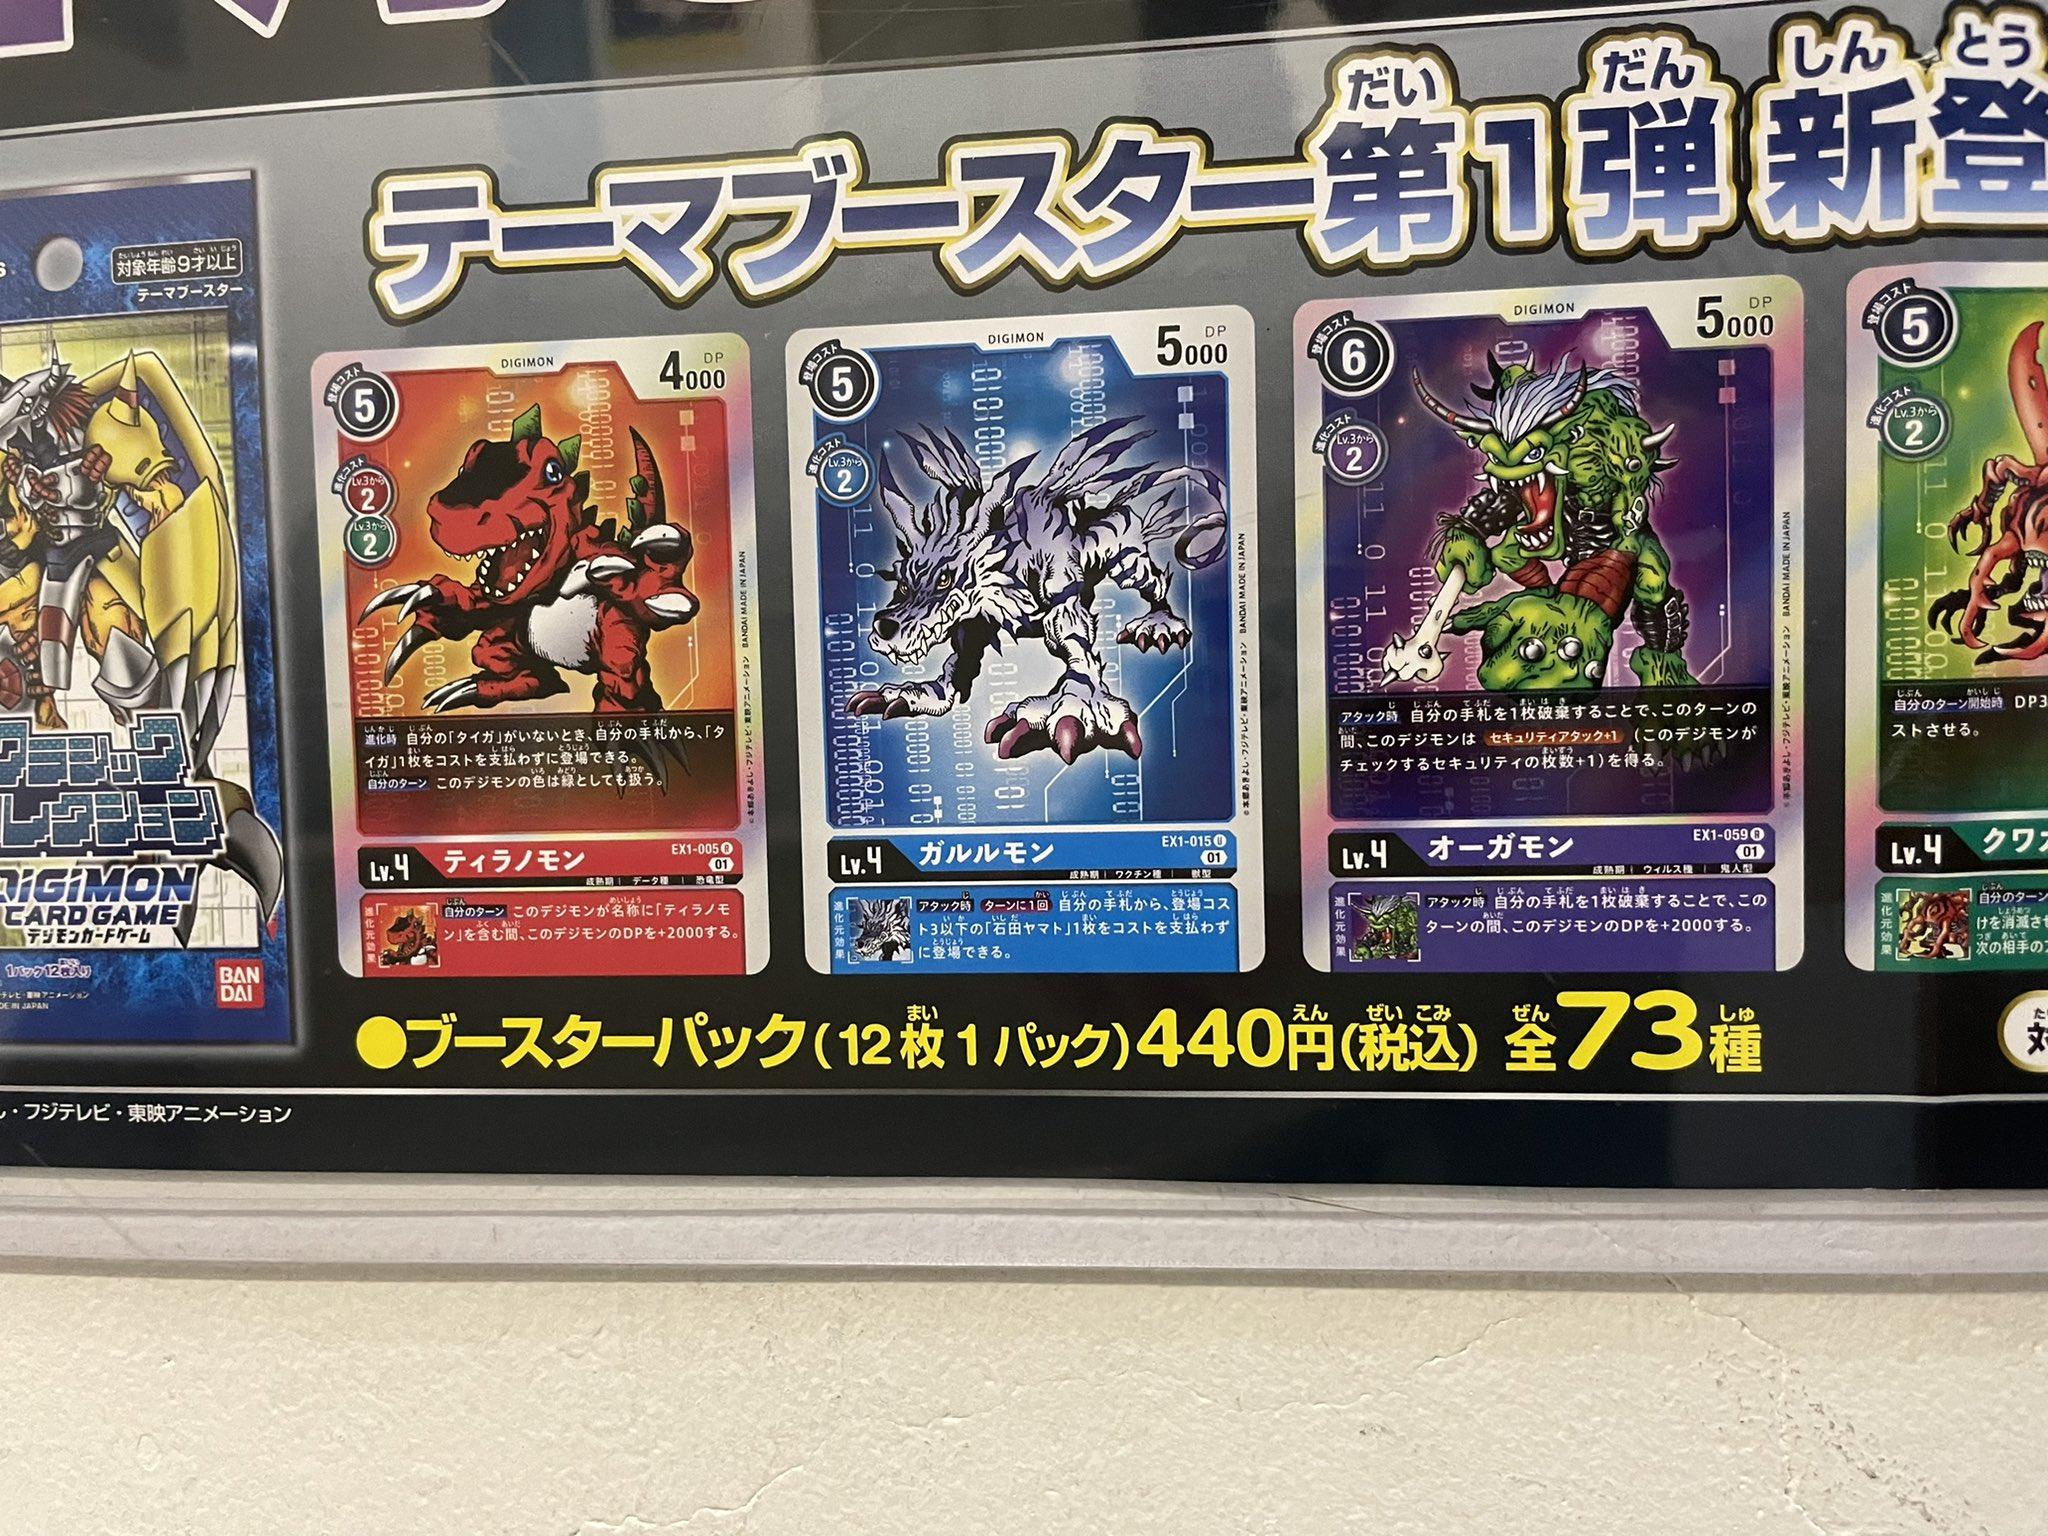 boosterex01_poster2_june29_2021.jpg